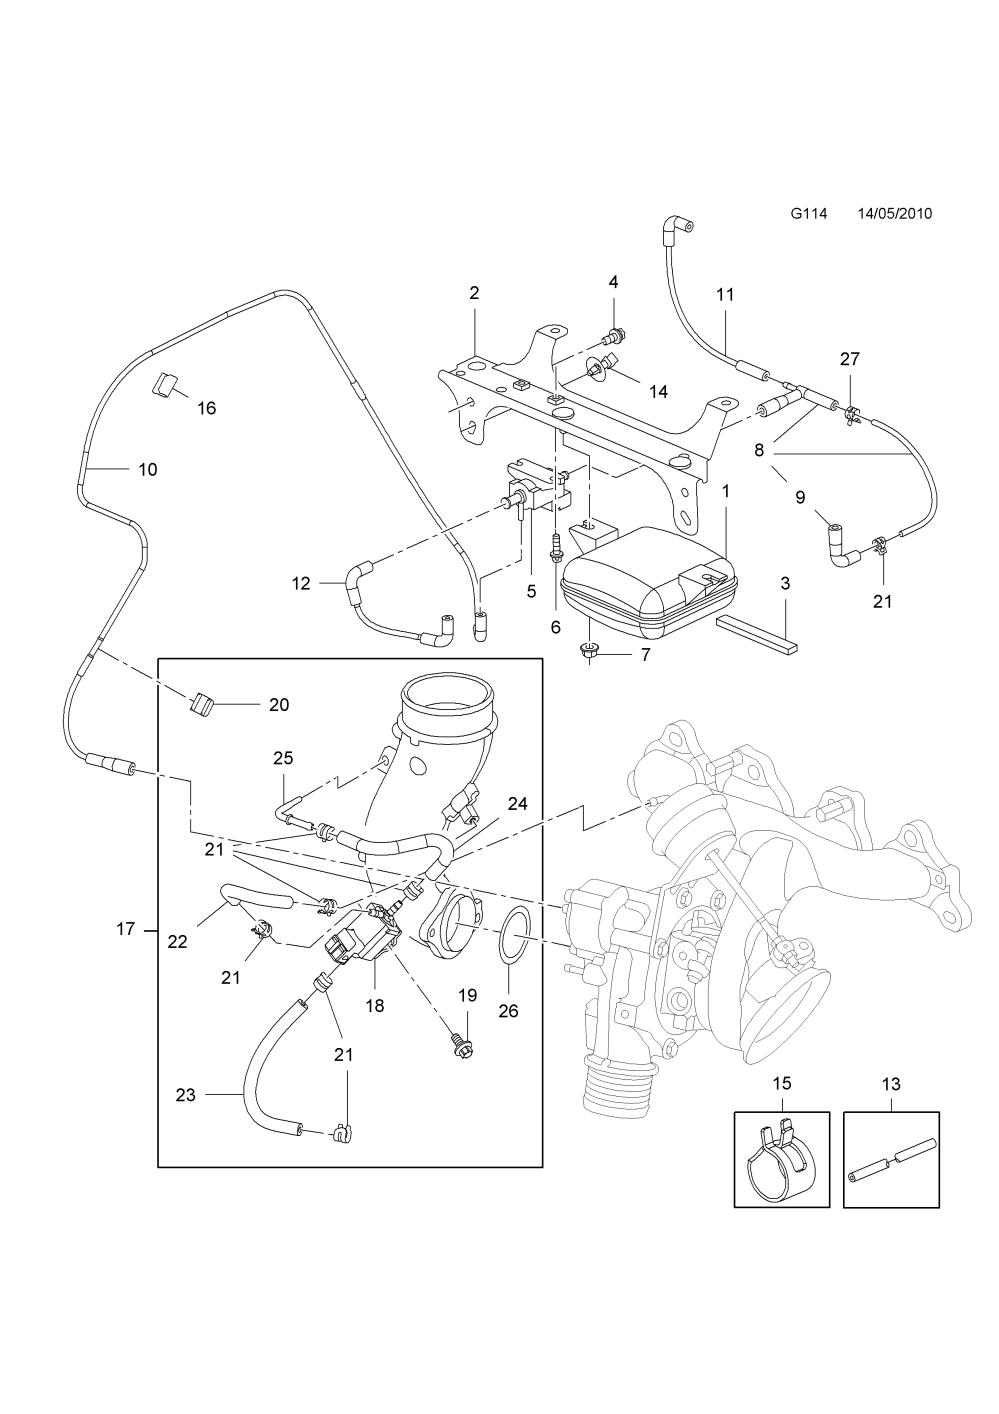 medium resolution of vauxhall vivaro vacuum diagram wiring diagram pass wiring diagram for vauxhall vivaro